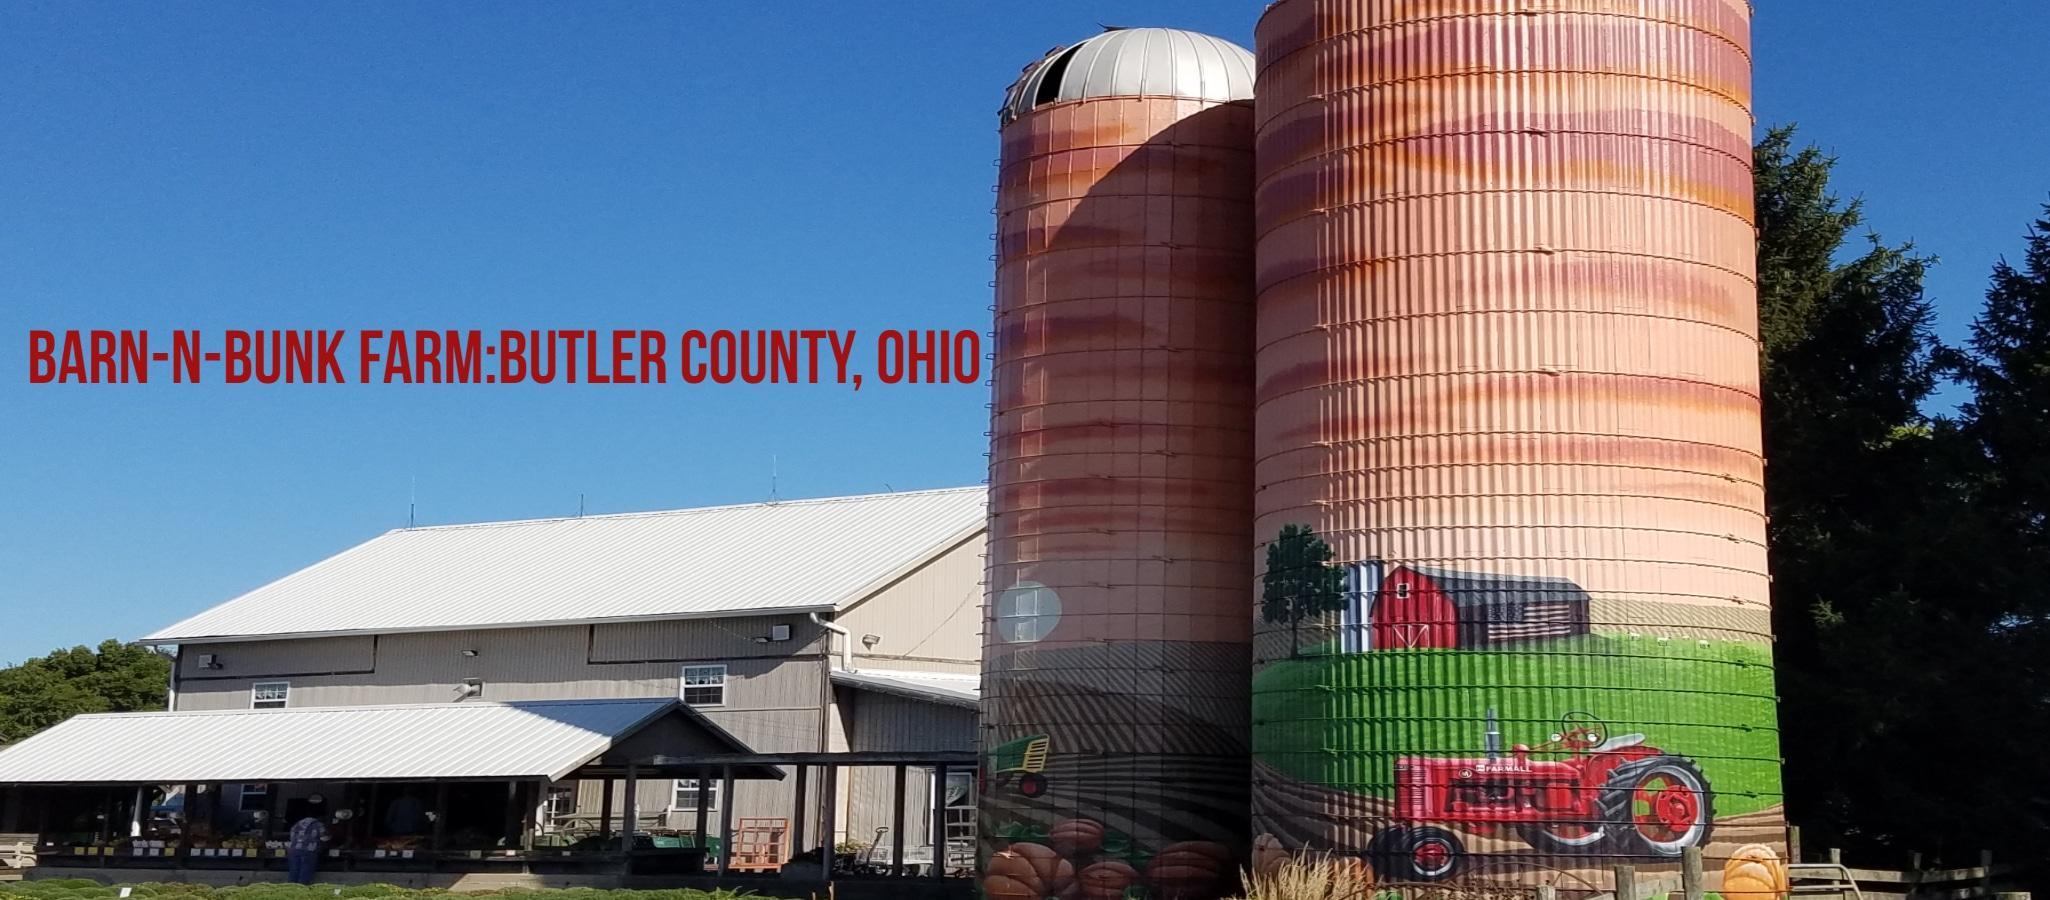 Barn-N-Bunk Farm Market: Spend A Day On An Ohio Farm